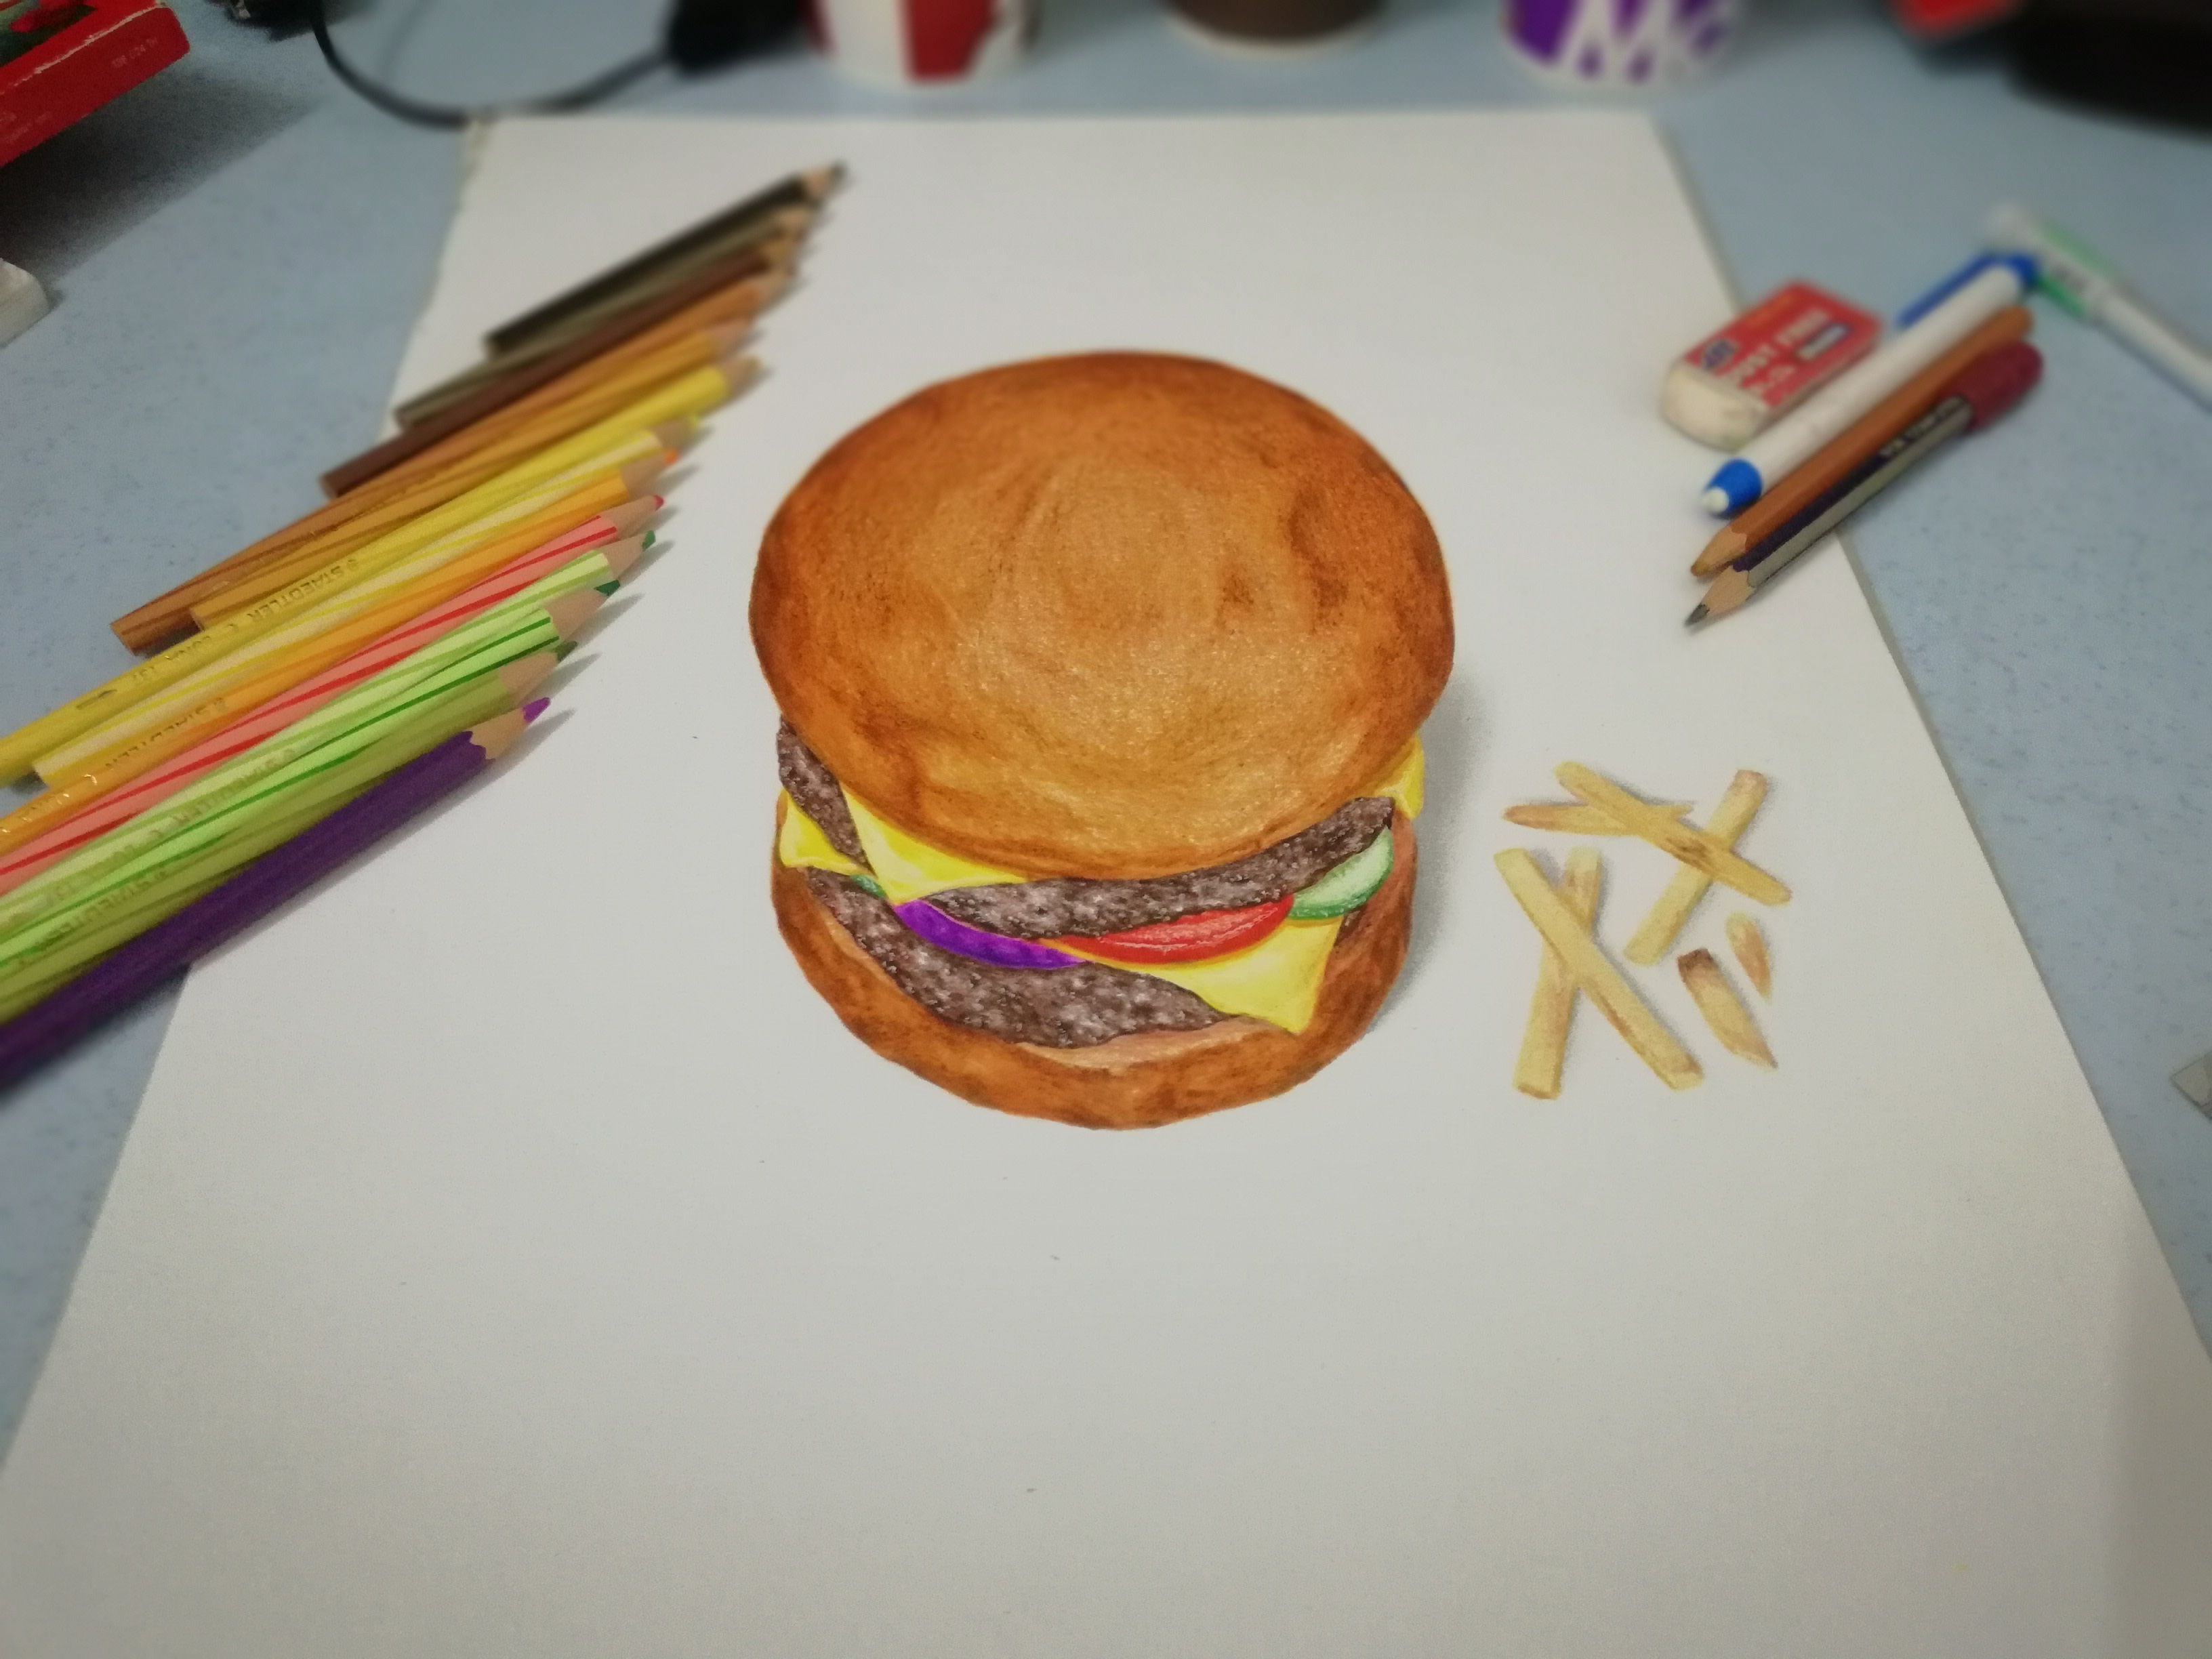 3D Burger Drawing on A3 by Kaeious Ooi 3D Burger drawing by Kaeious Ooi with french fries Instagram Kaeiousart FaceBook Kaeious Ooi